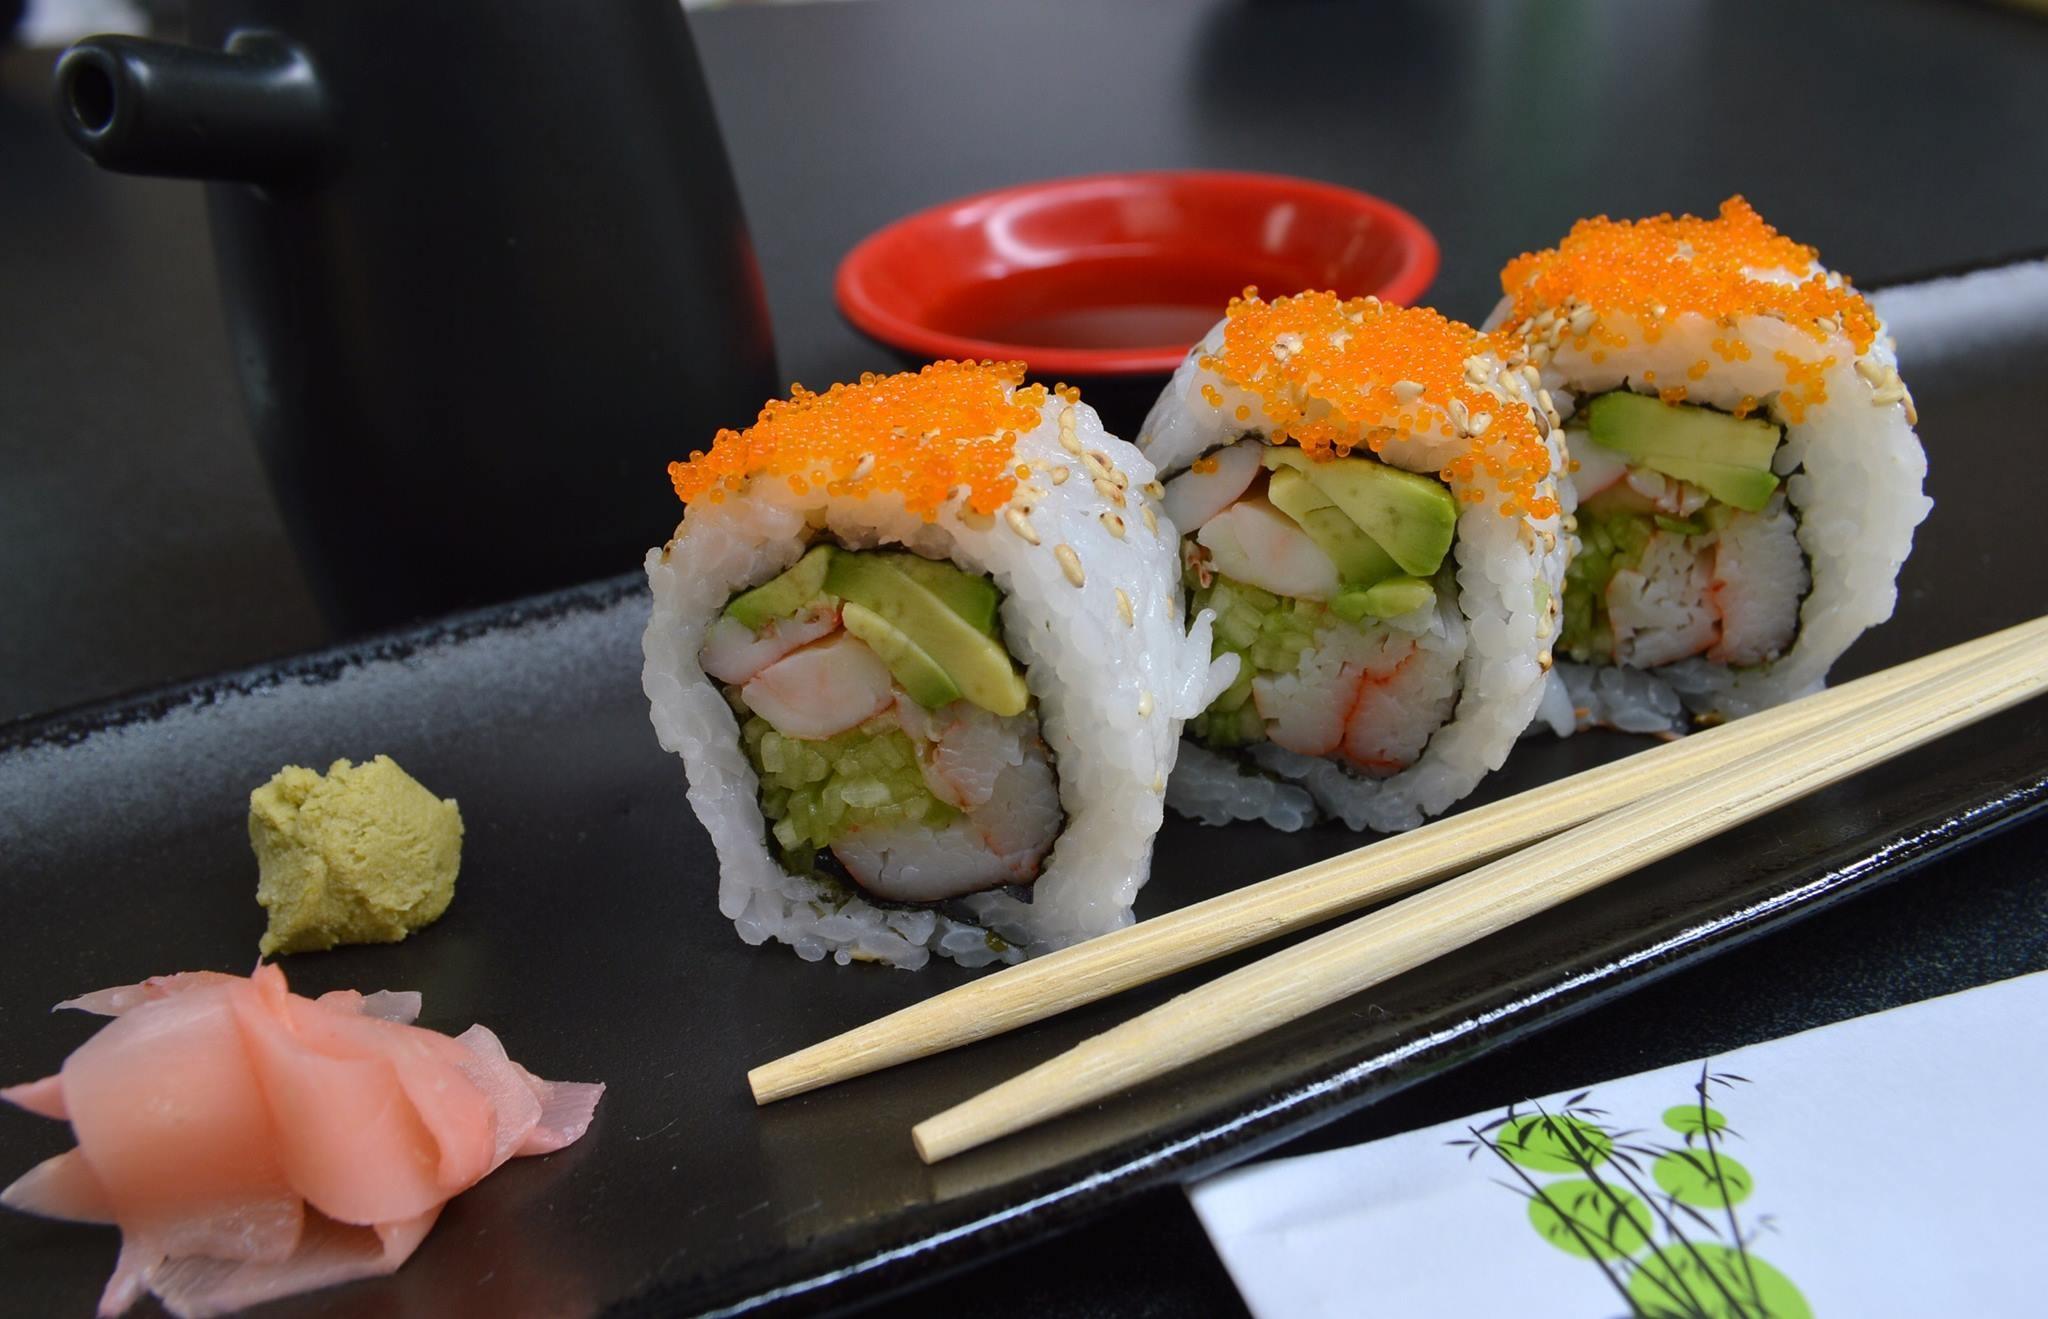 еда роллы васаби имбирь food rolls wasabi ginger без смс